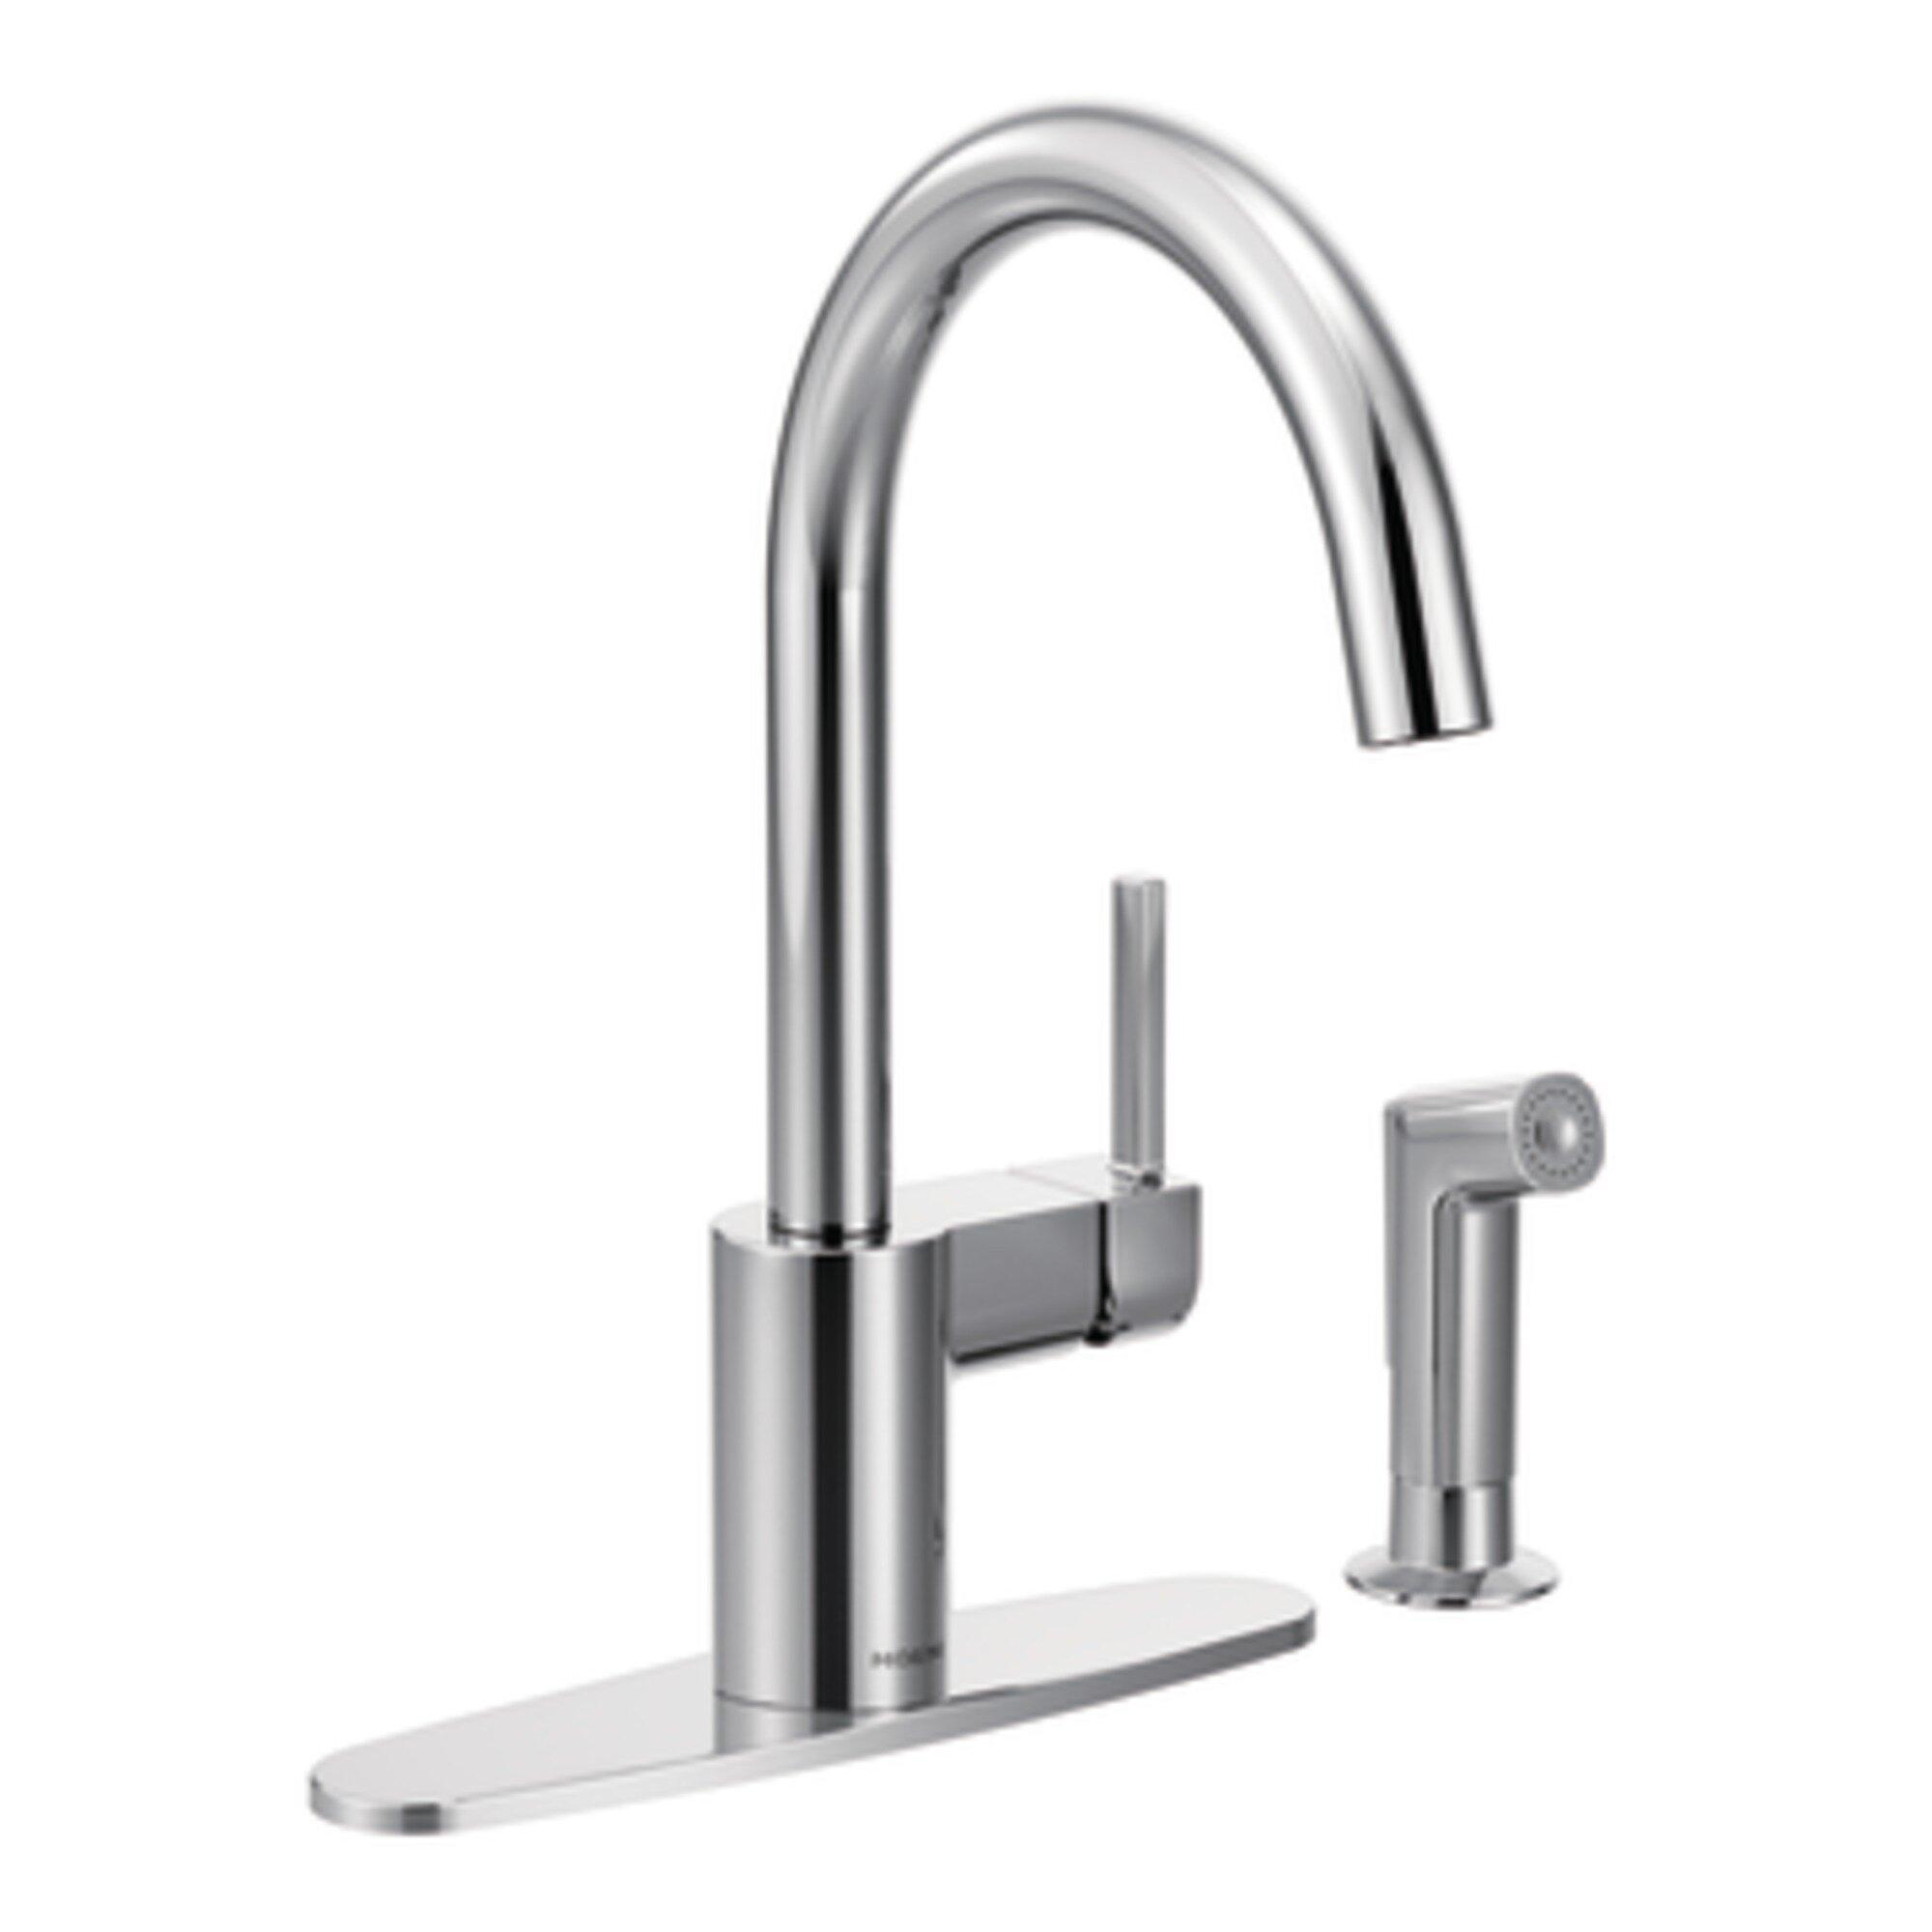 Moen Align Single Handle Deck Mounted Kitchen Faucet Reviews Wayfair